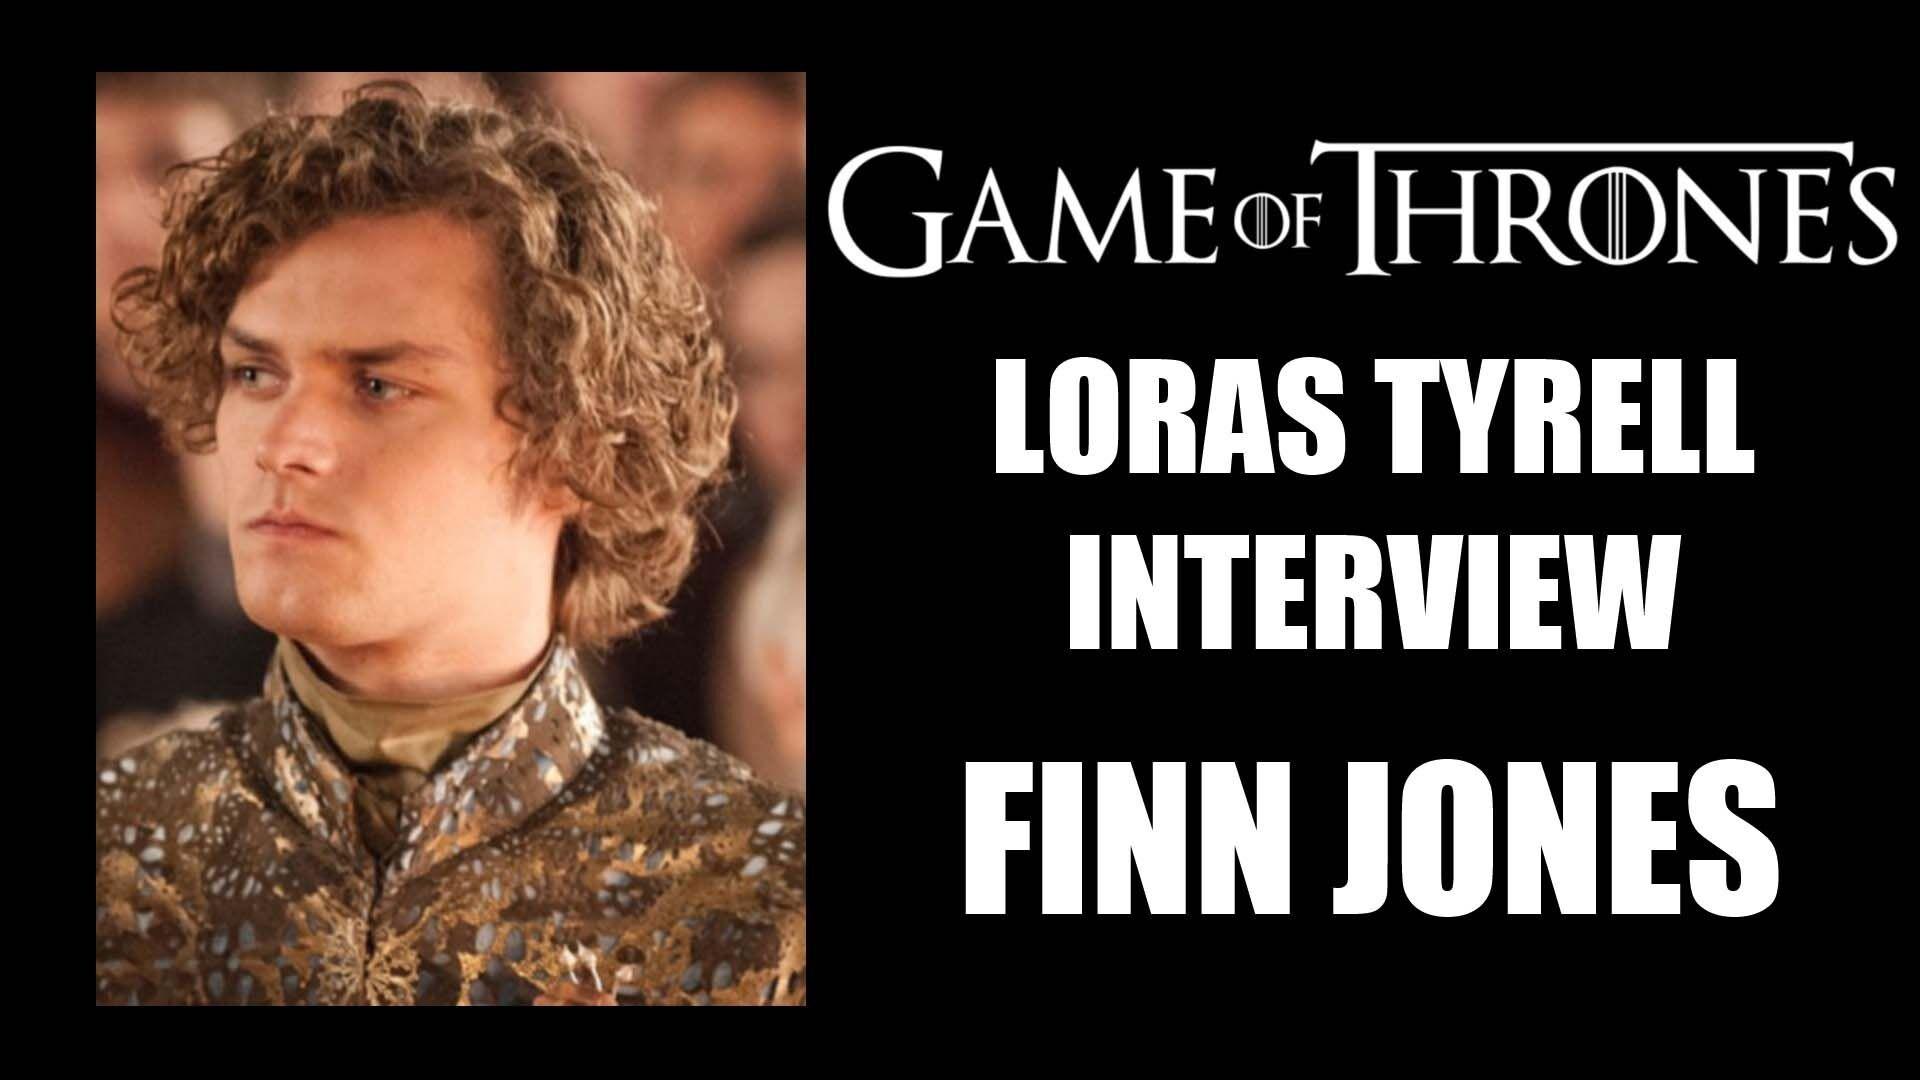 Game of Thrones Loras Tyrell - Finn Jones